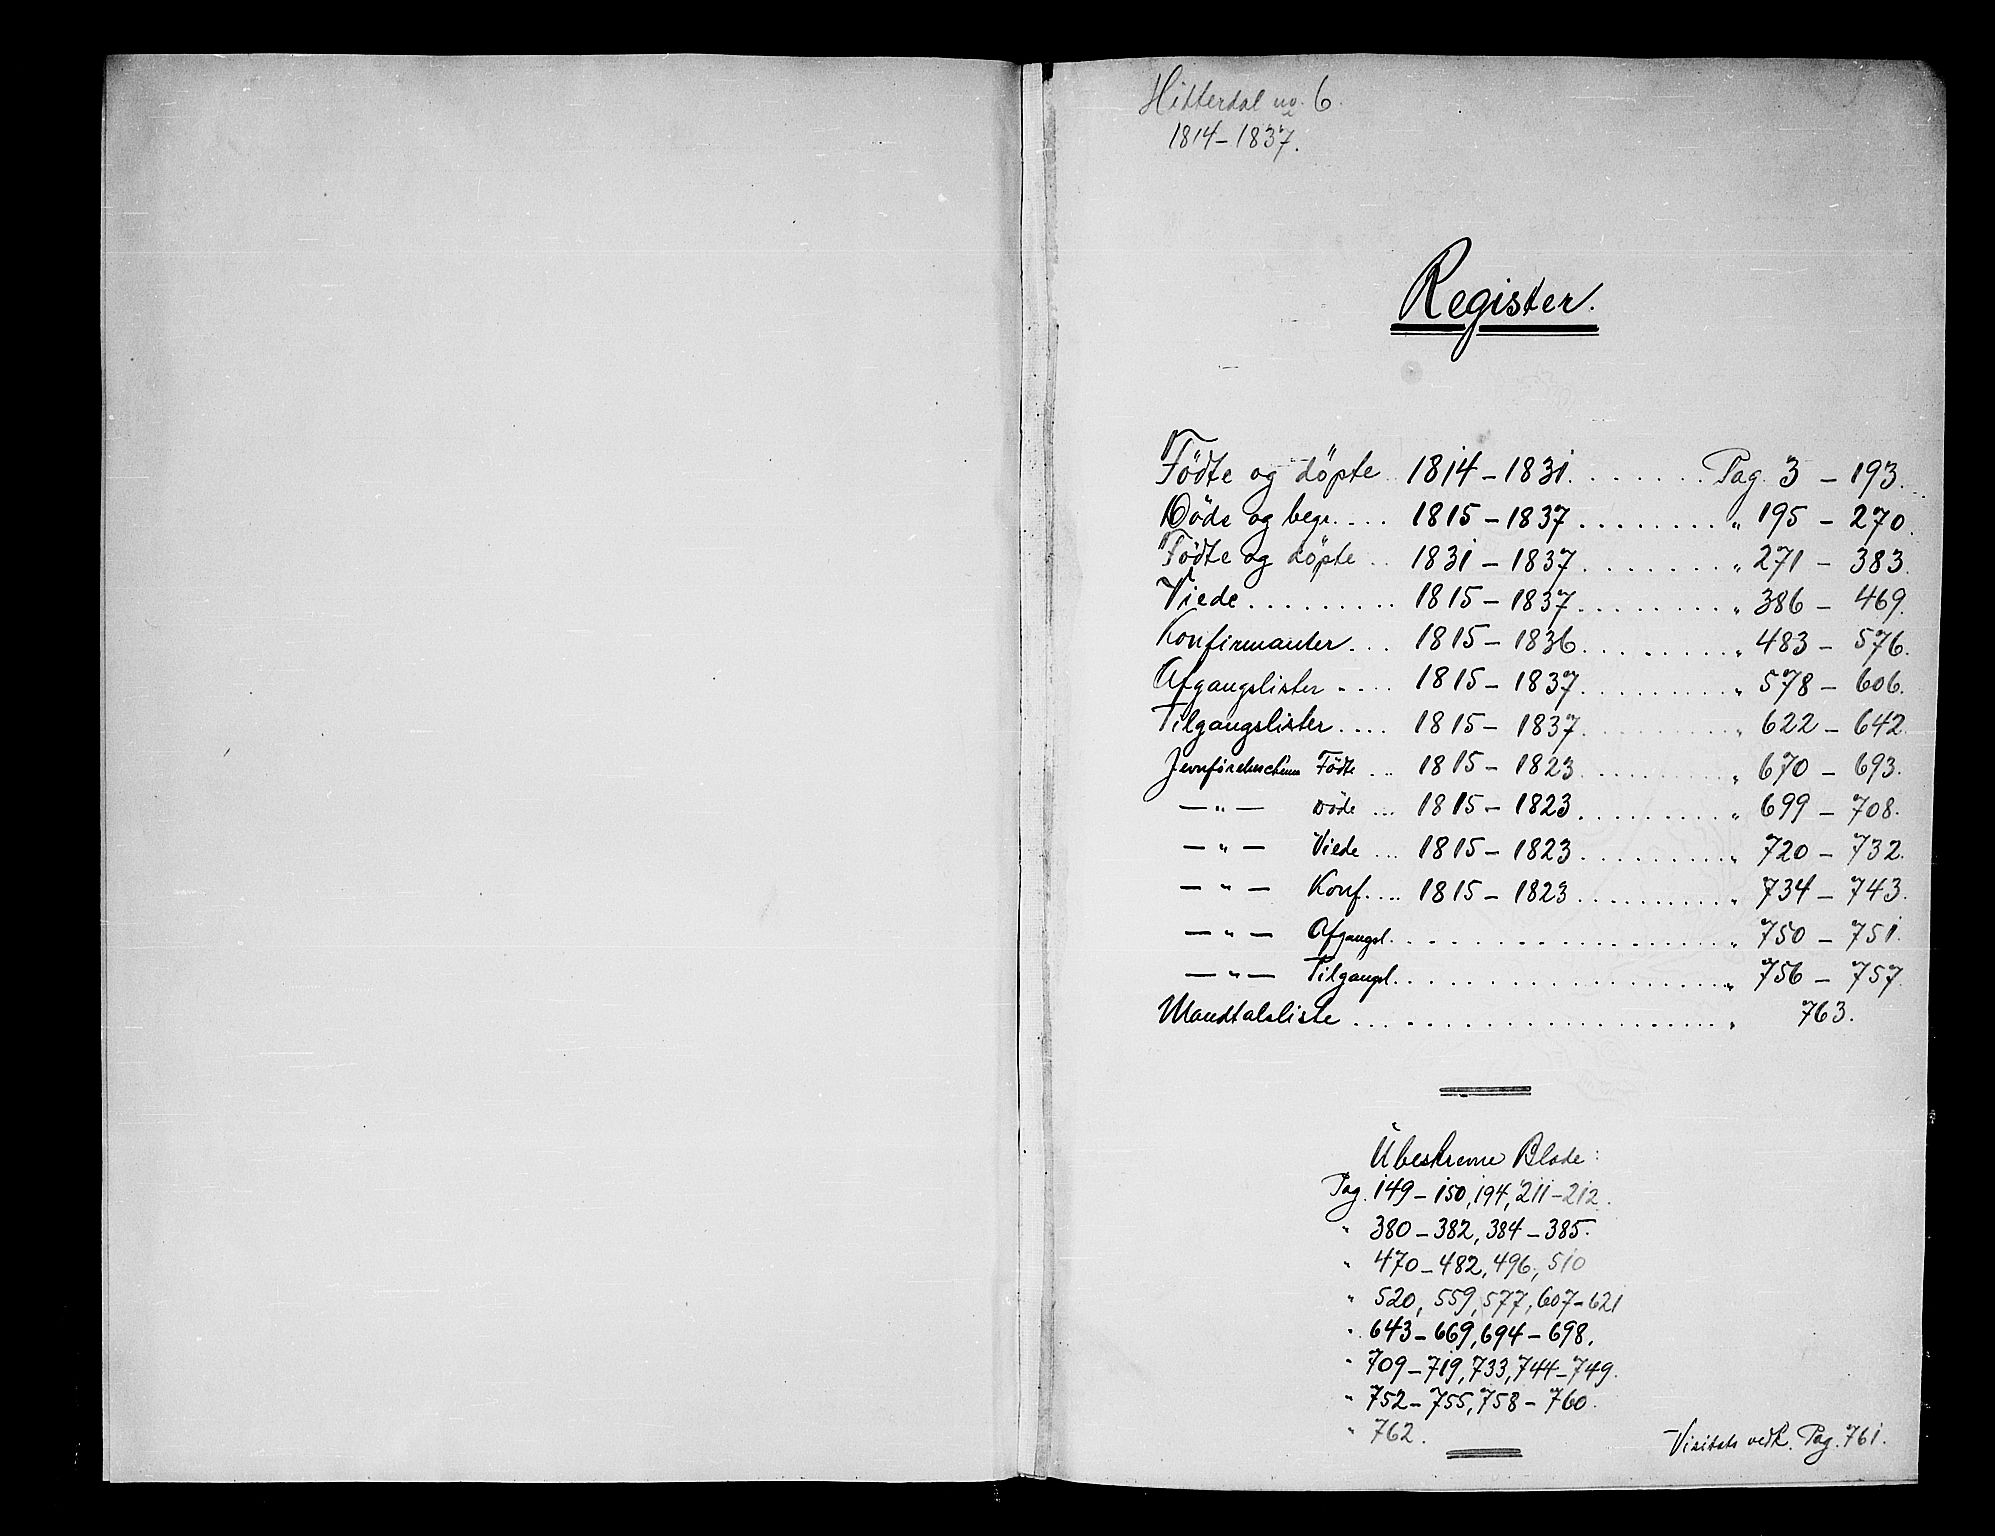 SAKO, Heddal kirkebøker, F/Fa/L0005: Ministerialbok nr. I 5, 1814-1837